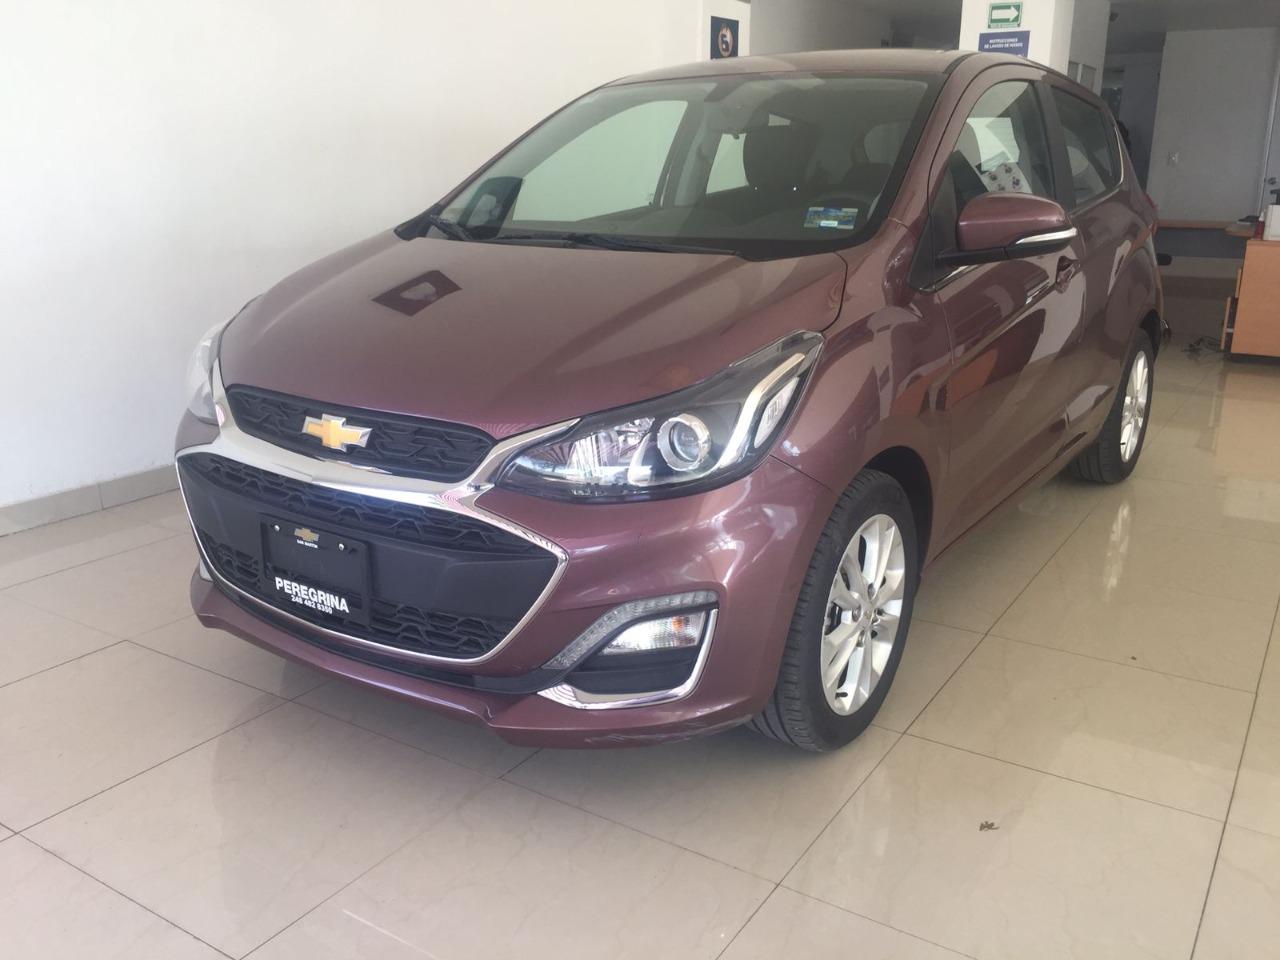 Chevrolet Spark NG 2019 EN VENTA